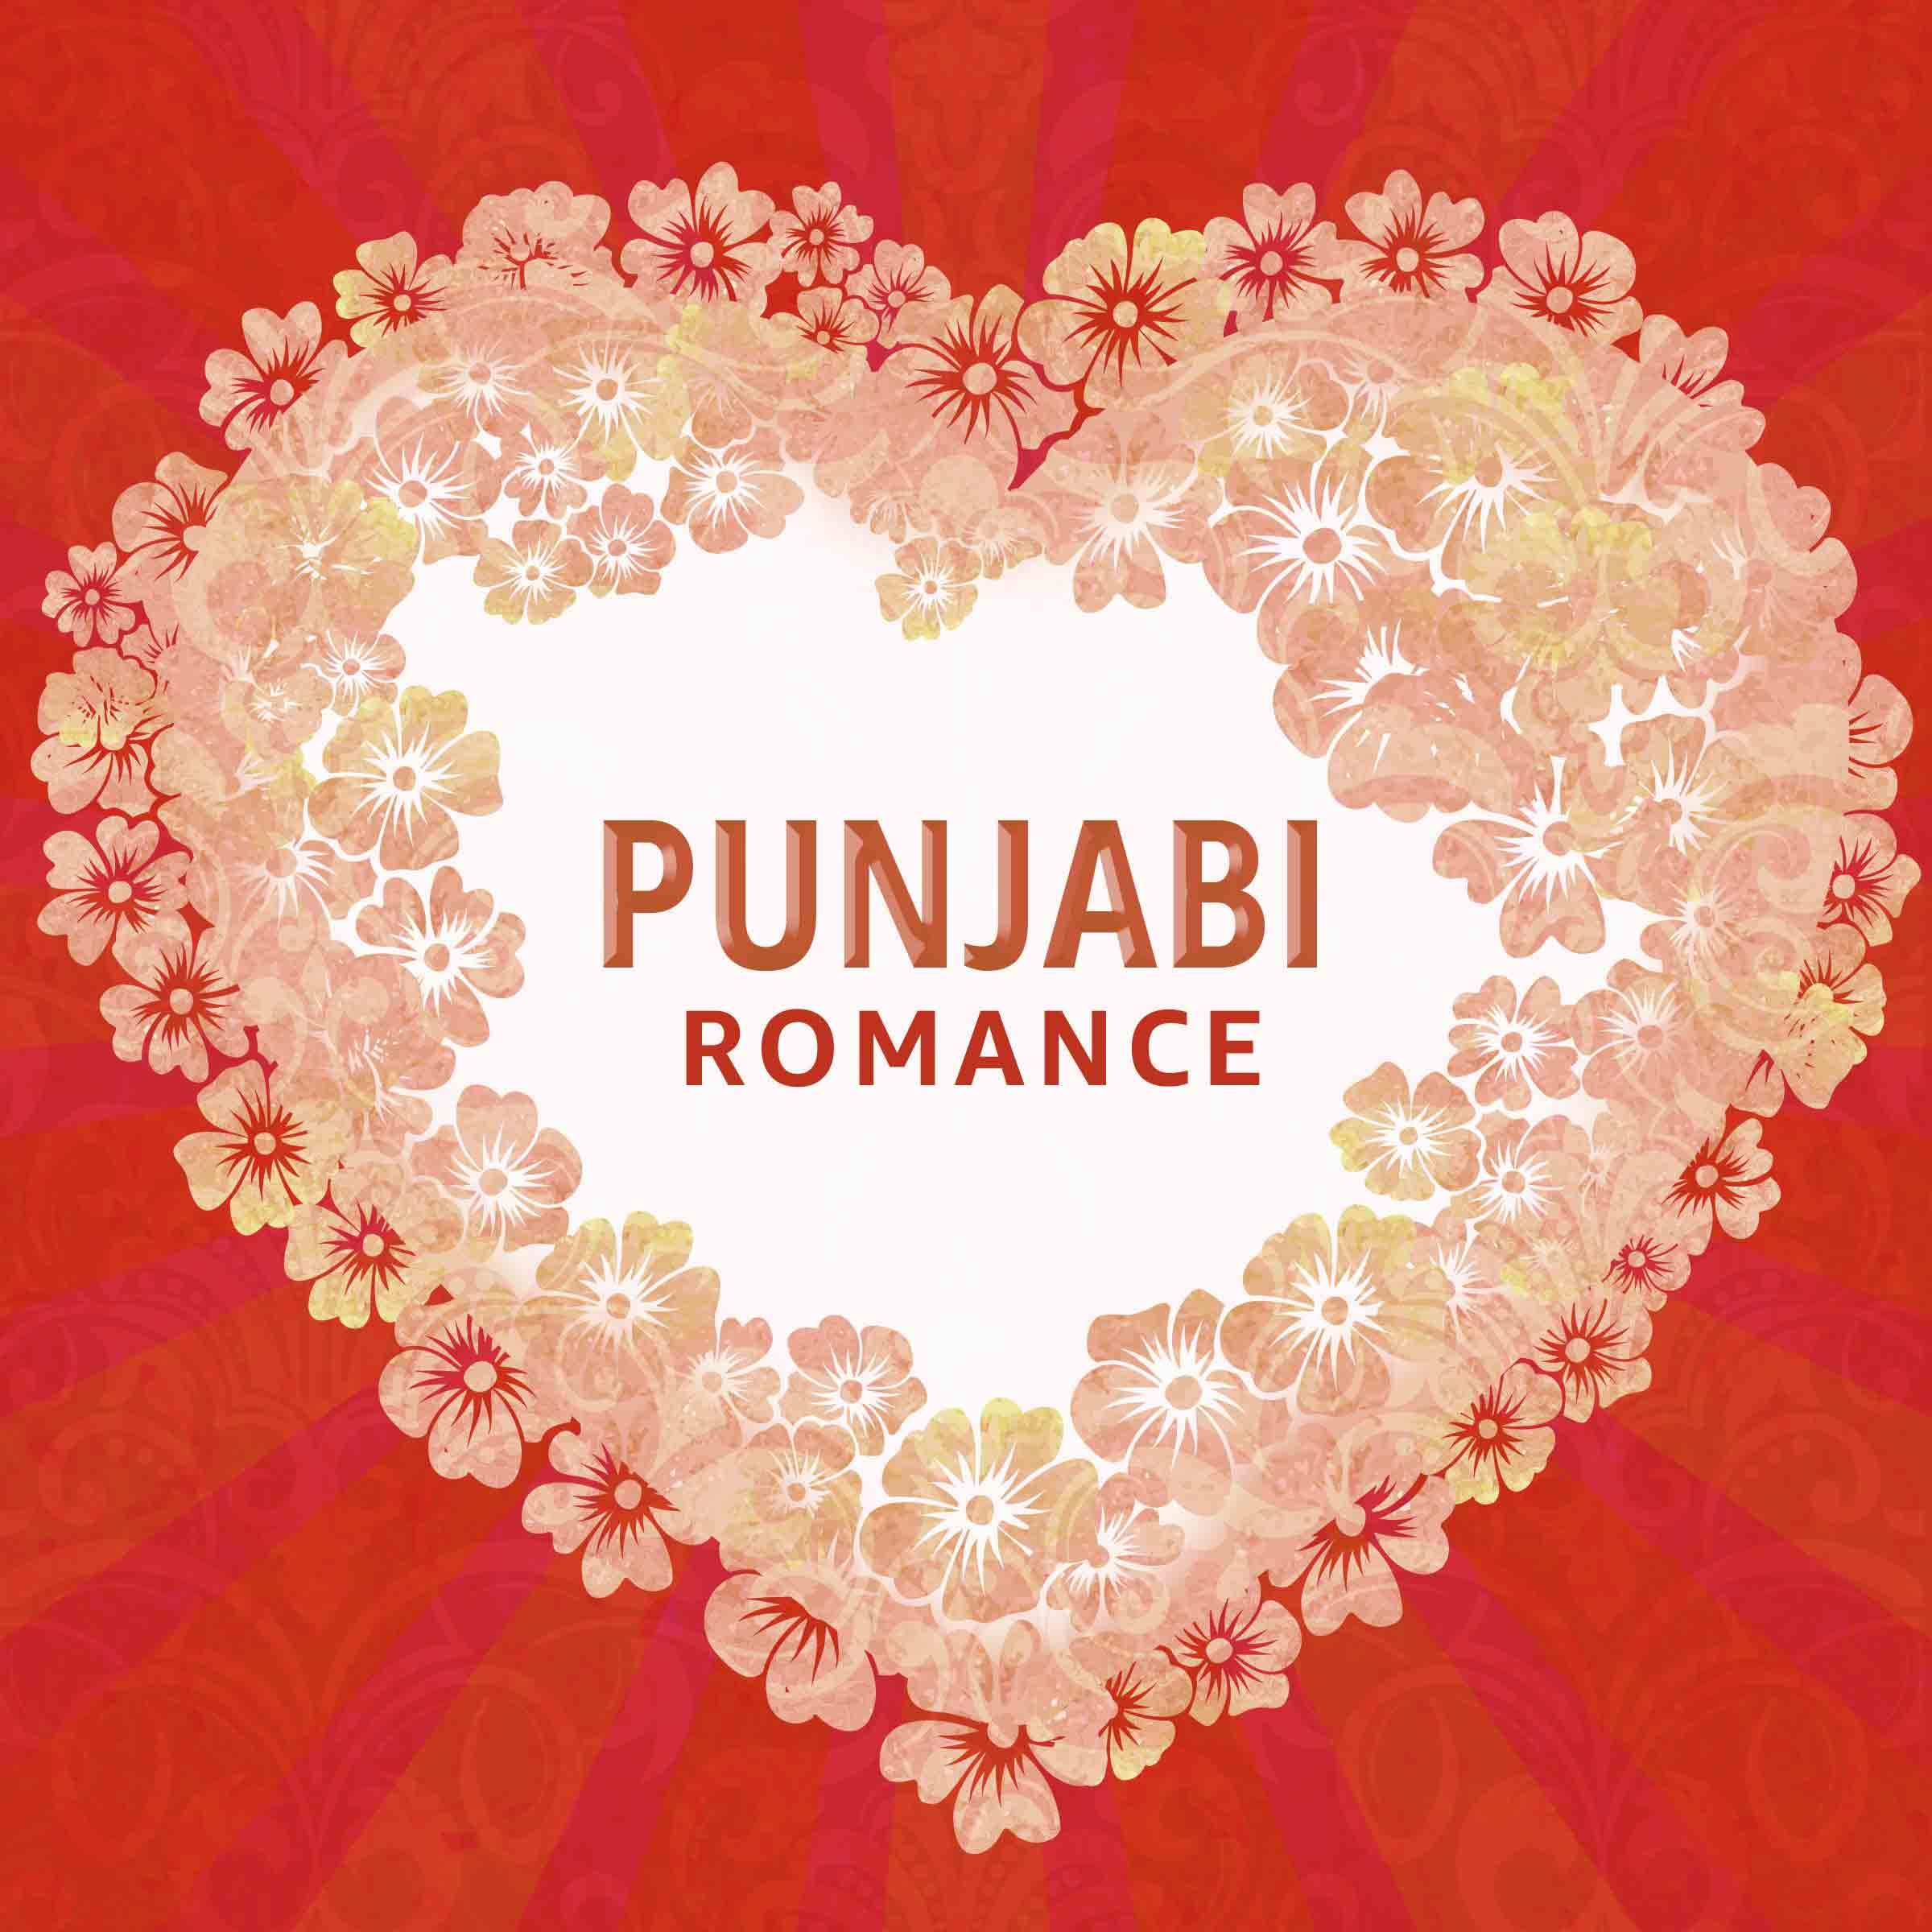 Punjabi Romance